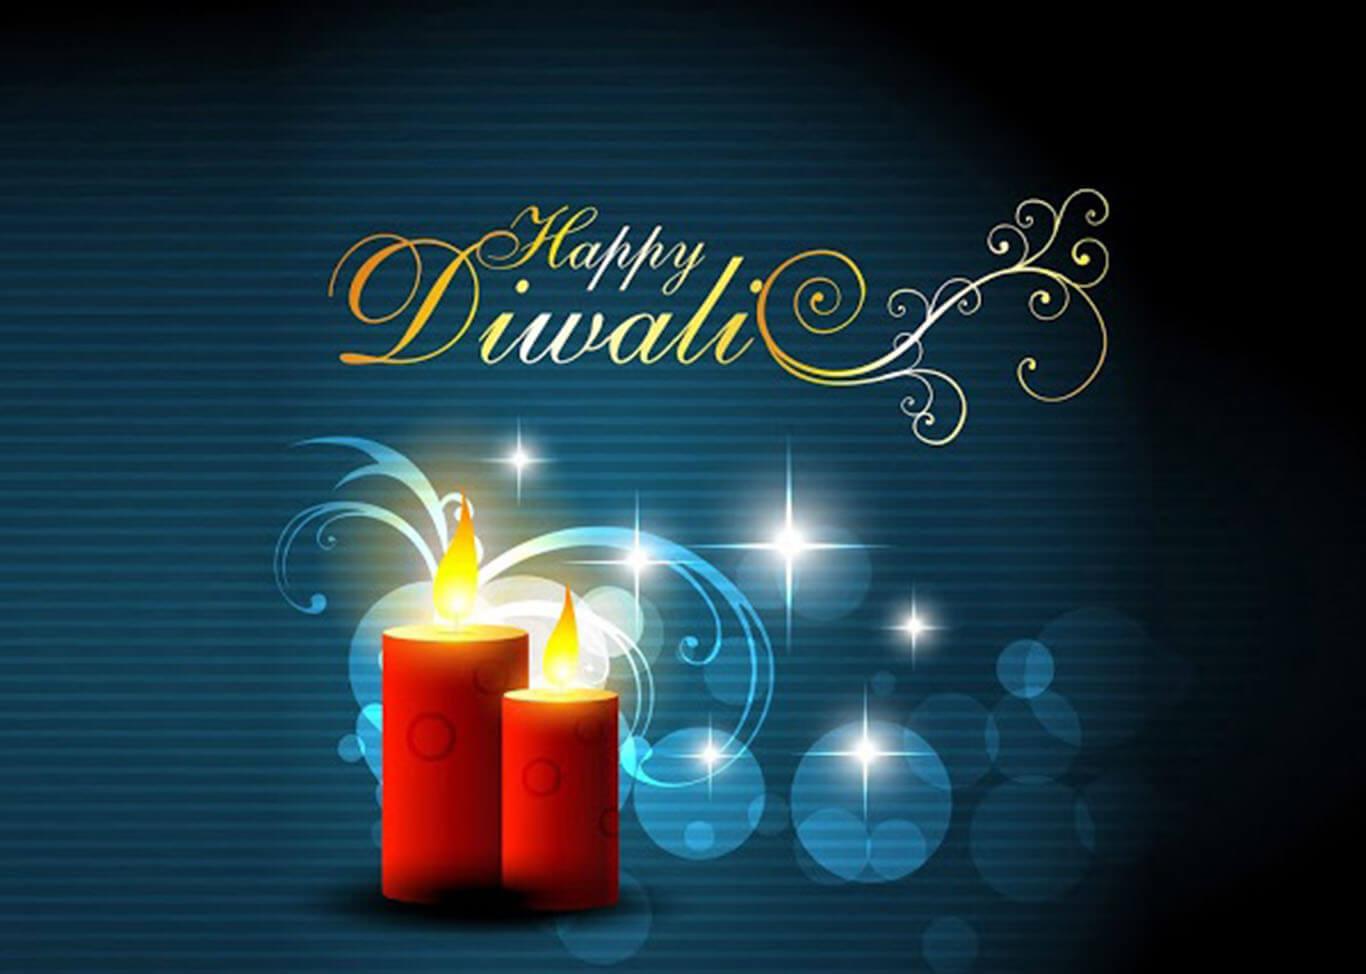 happy diwali crackers background desktop mobile wallpaper